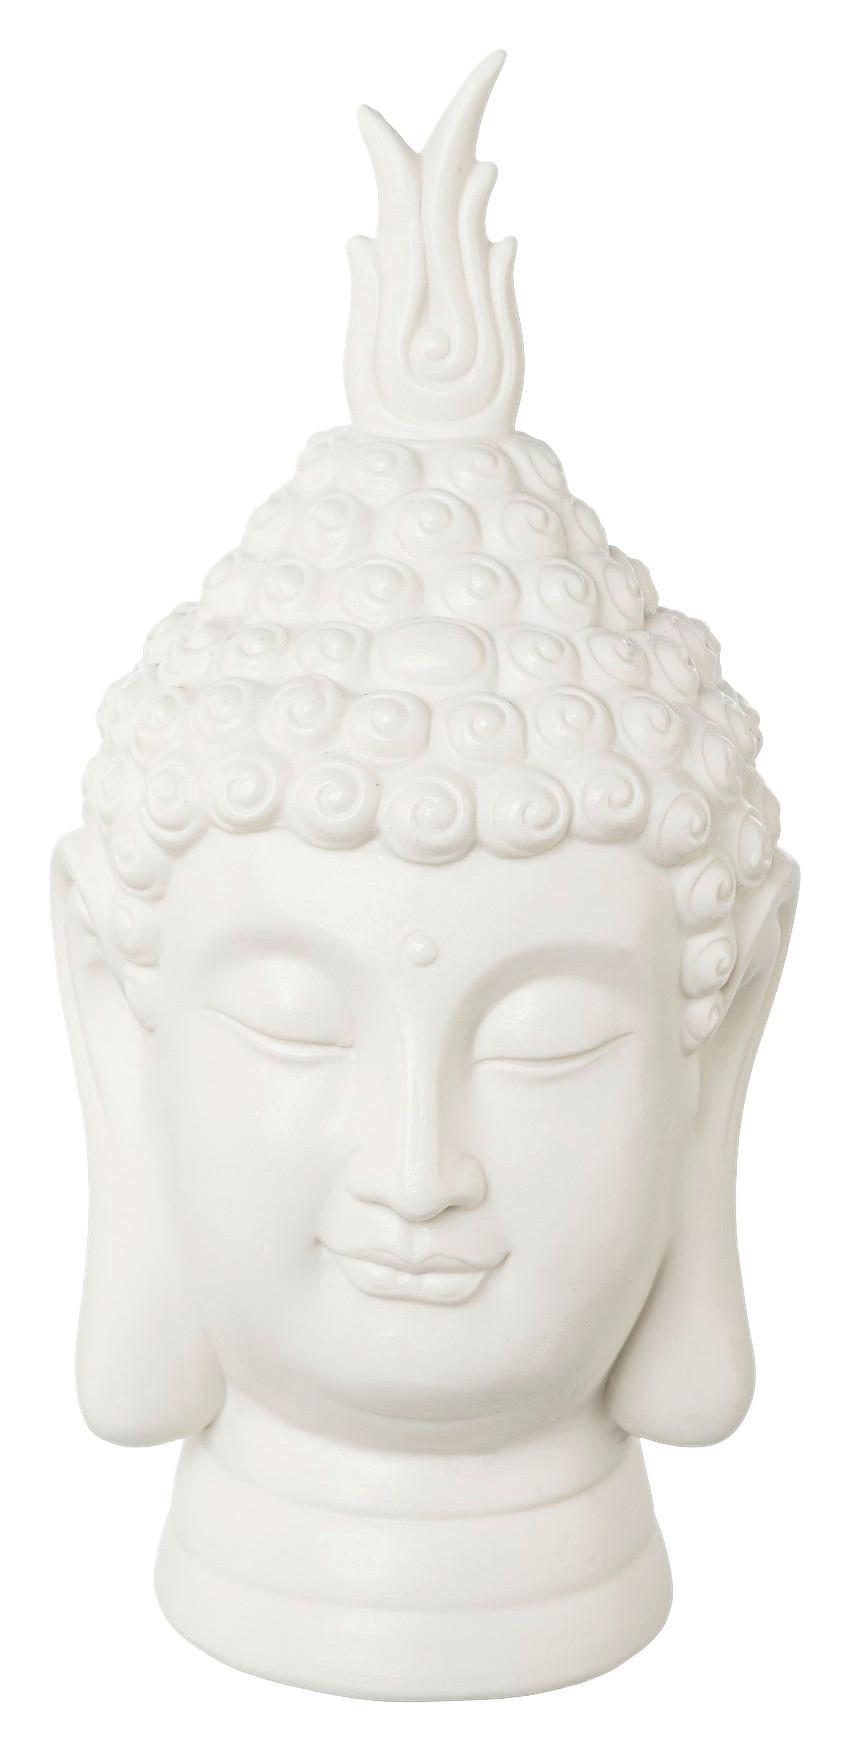 Image of Buddhakopf Bright II mit Beleuchtung